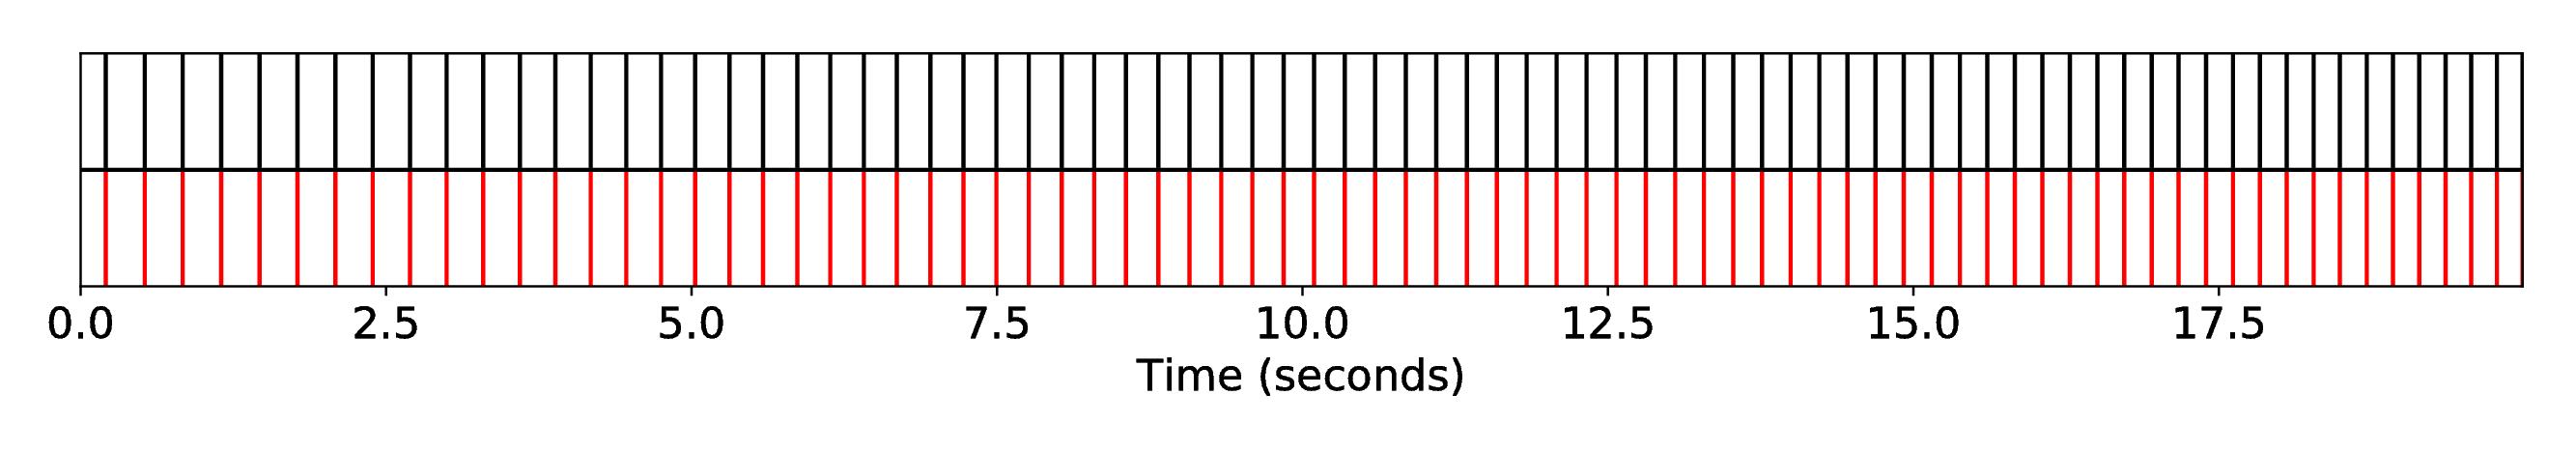 DP1_INT1_R-RW-Train__S-Broke__SequenceAlignment